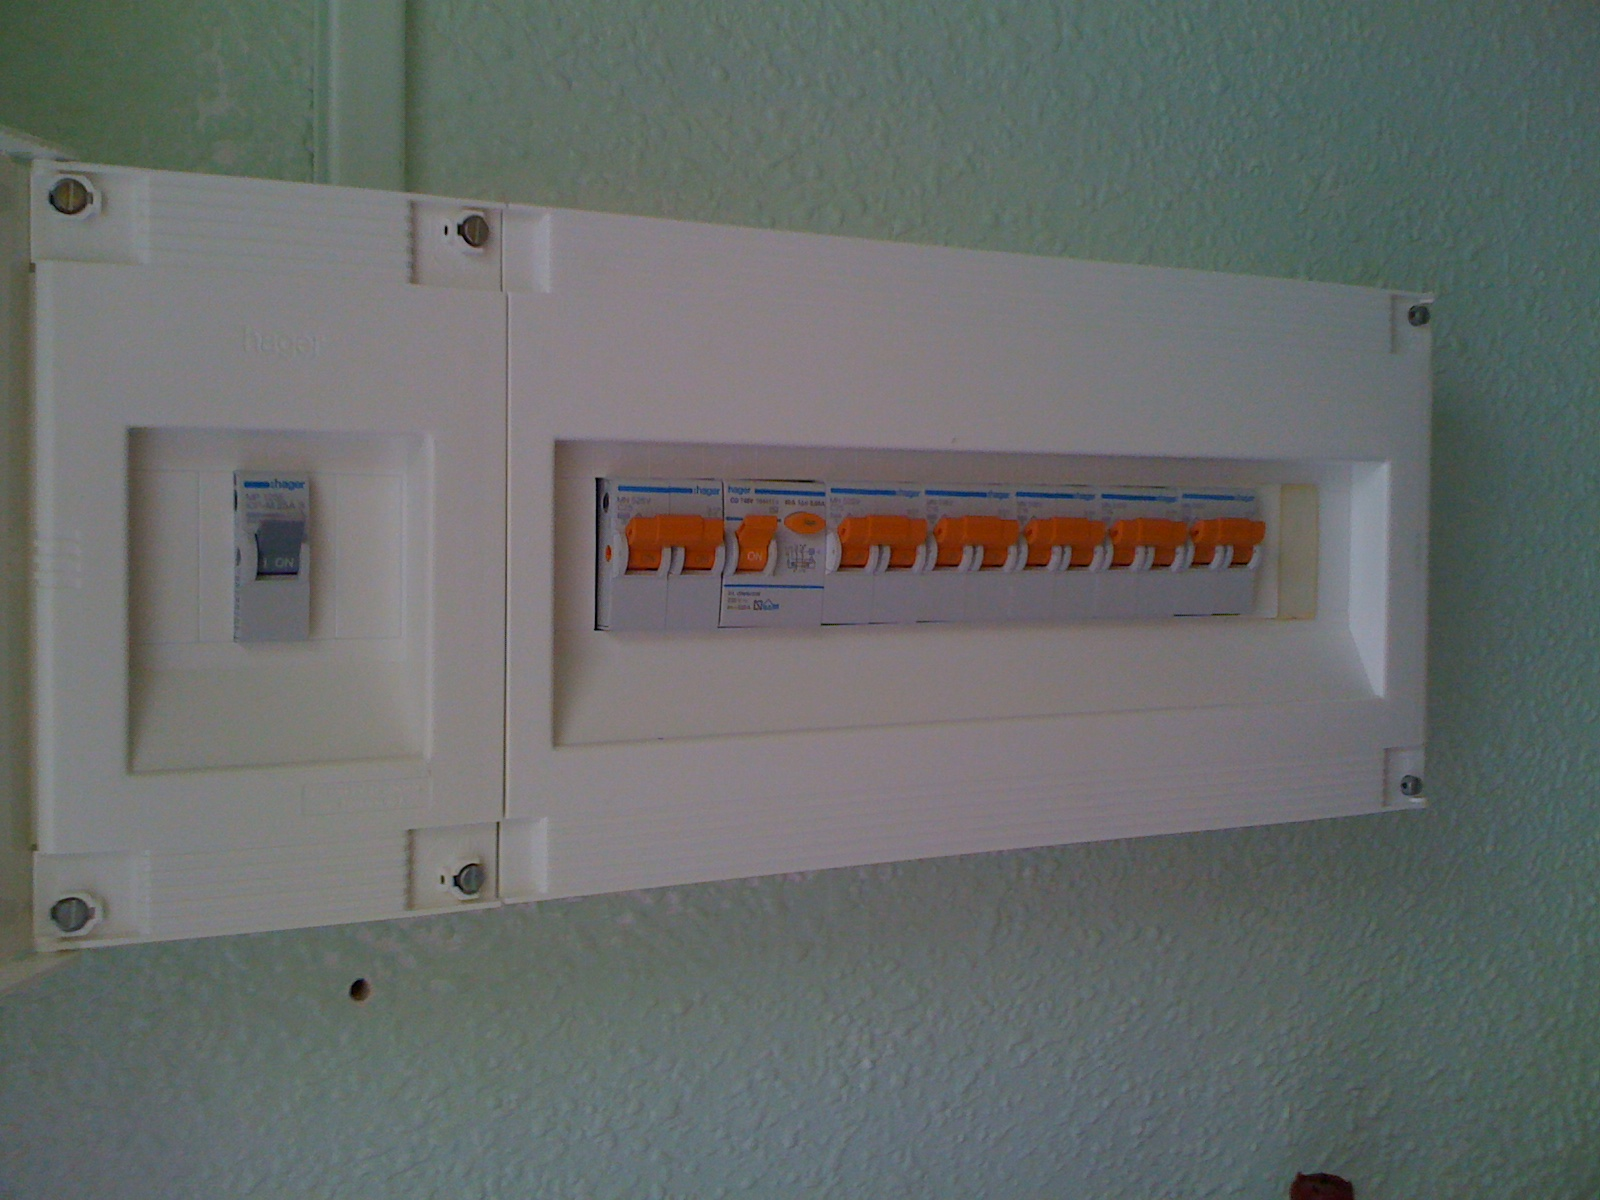 consumer units sparks in spain rh sparksinspain es Basic Electrical Wiring Diagrams Residential Electrical Wiring Diagrams